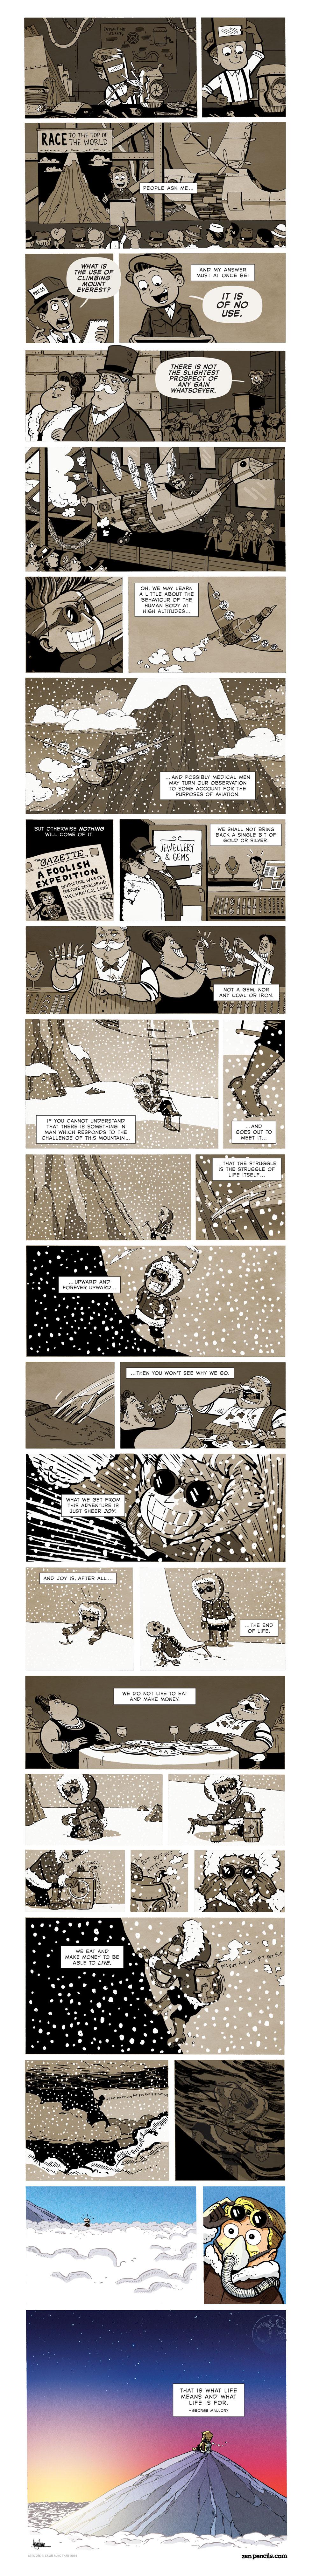 http://zenpencils.com/comic/mallory/